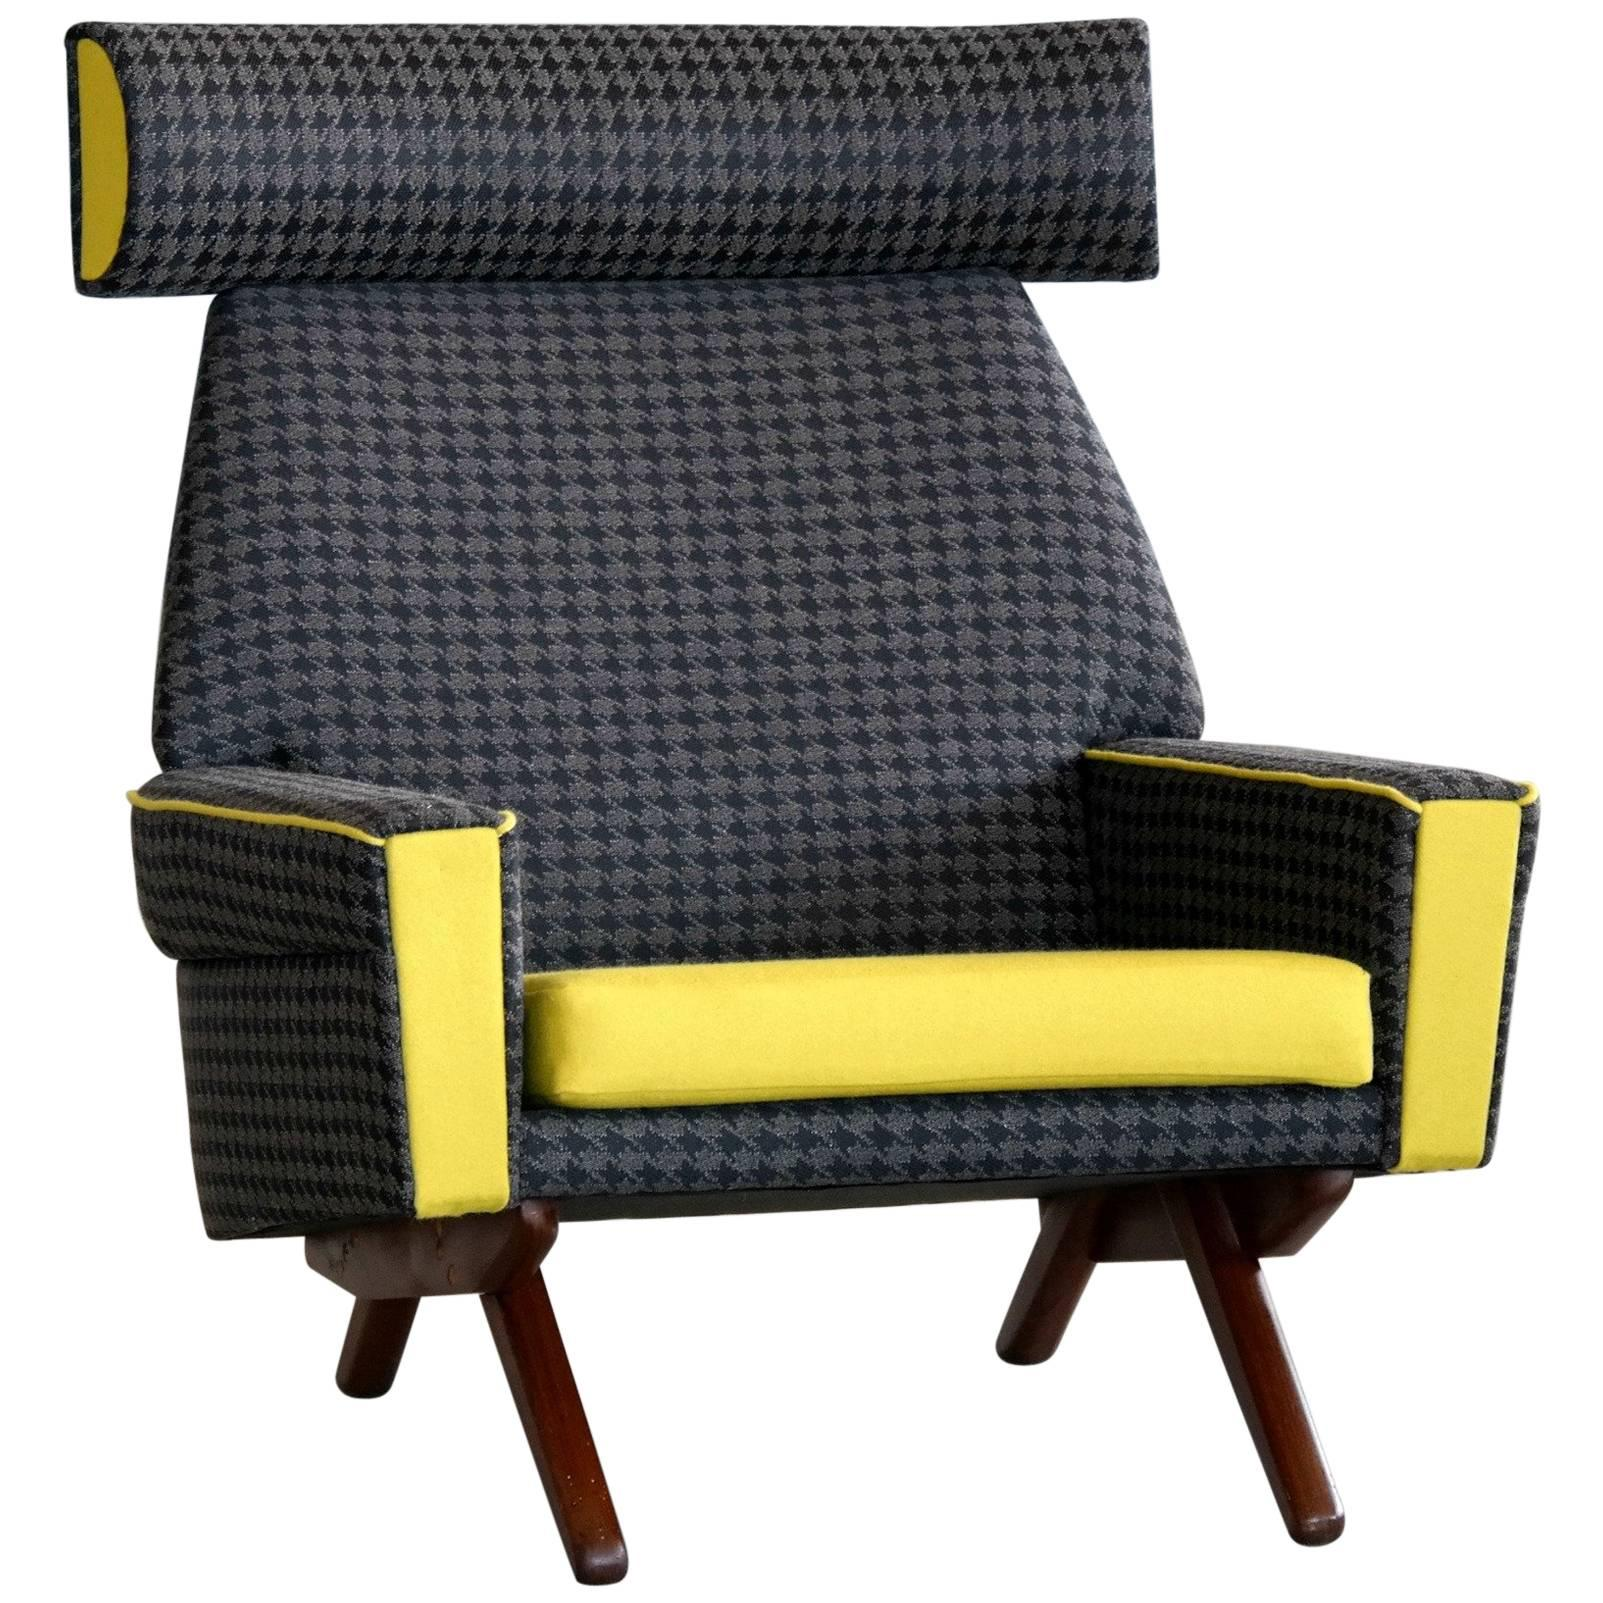 Danish Midcentury Chair by Leif Hansen for Kronen